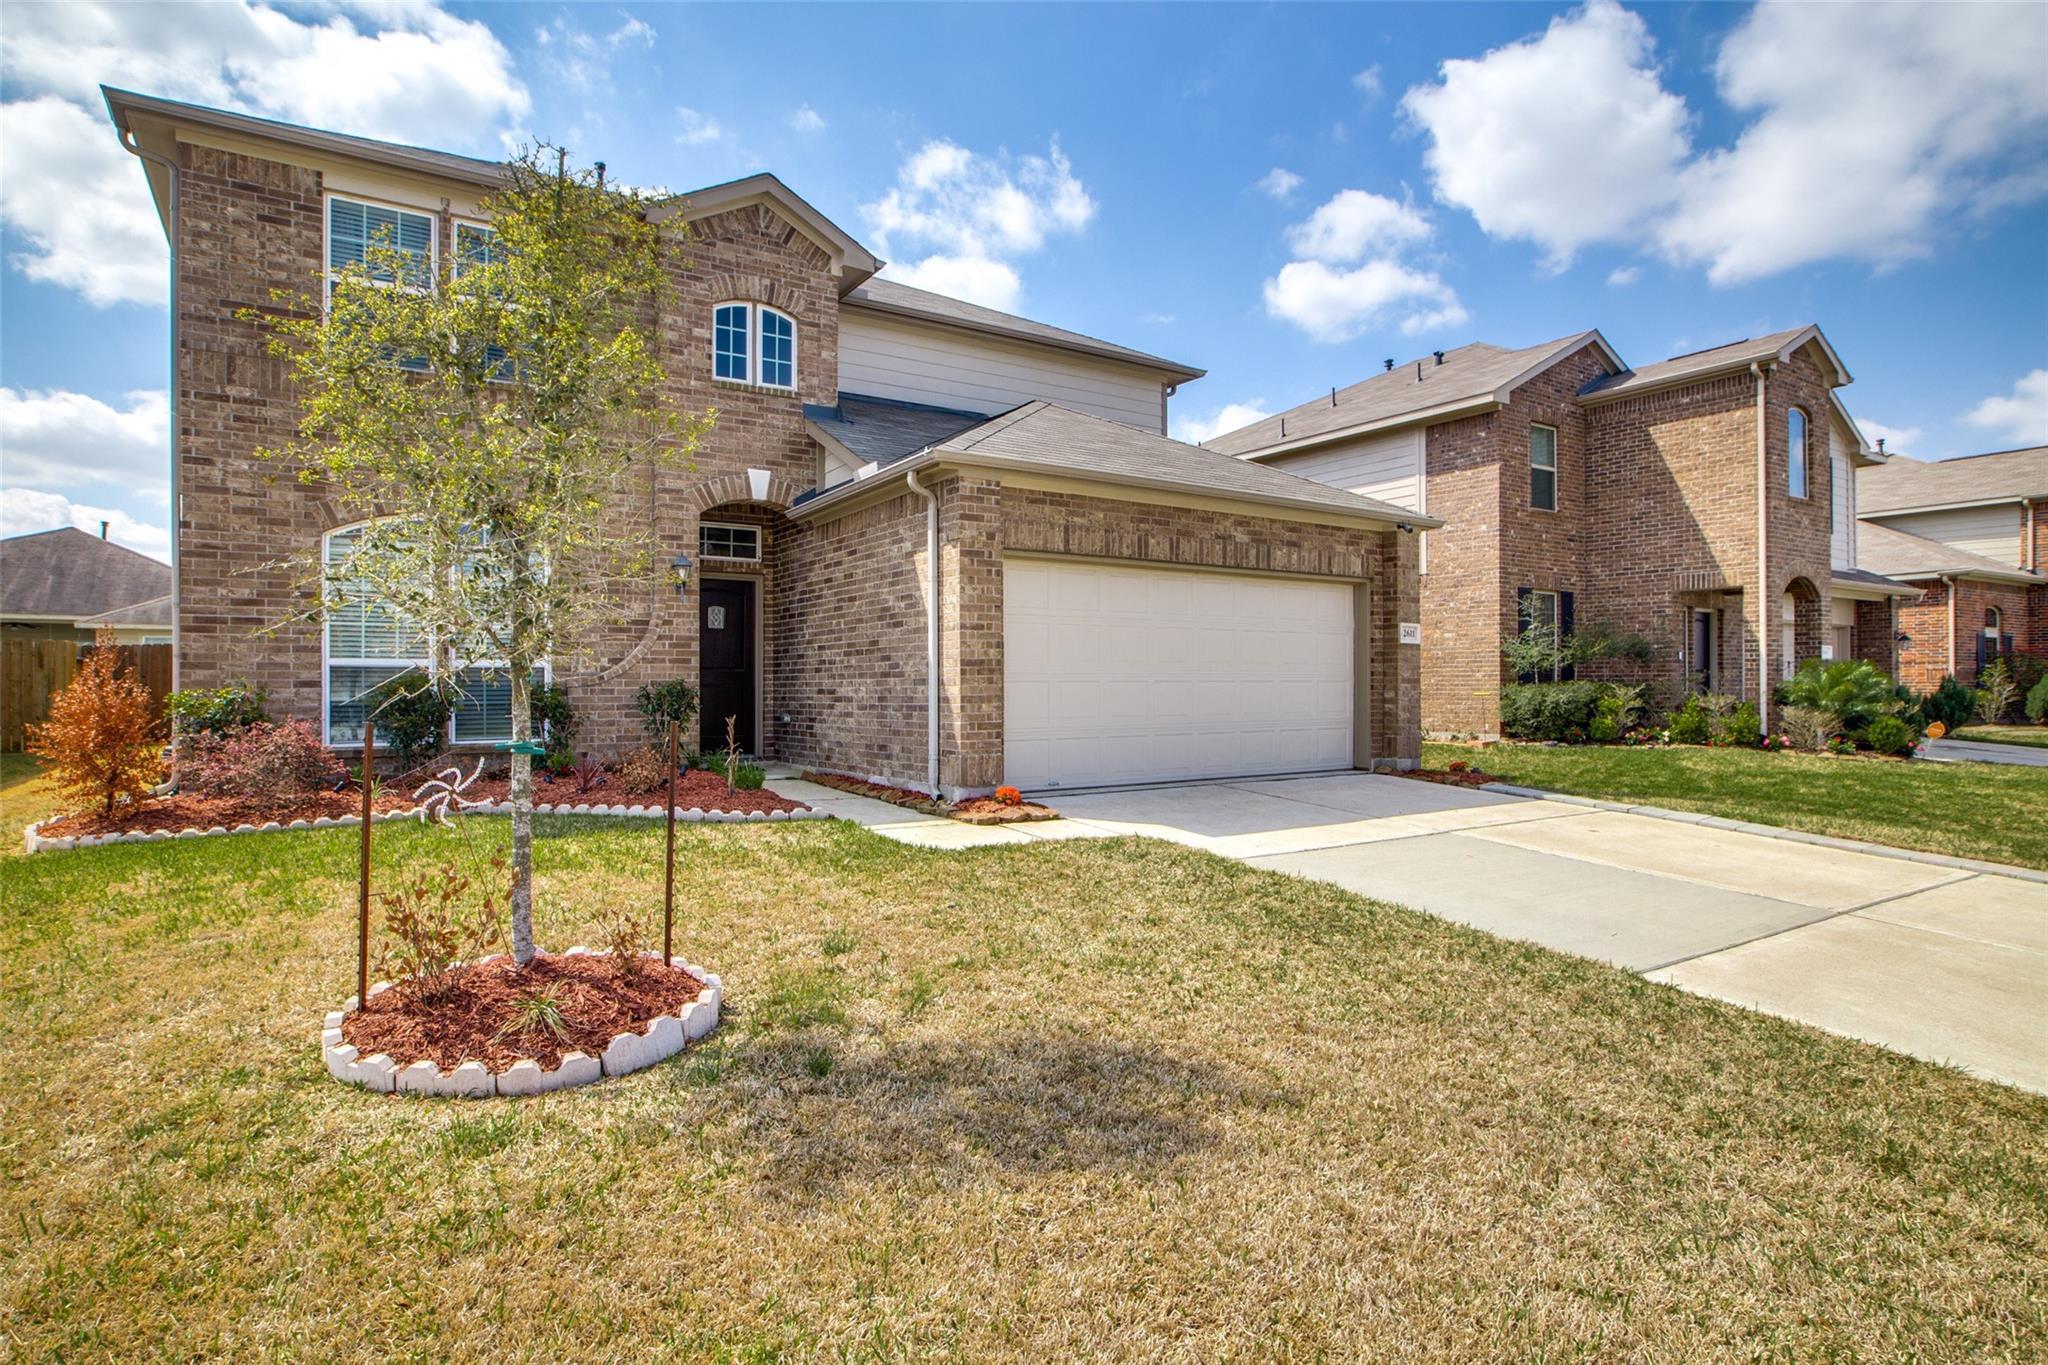 12611 Ashlynn Creek Trail Property Photo - Houston, TX real estate listing